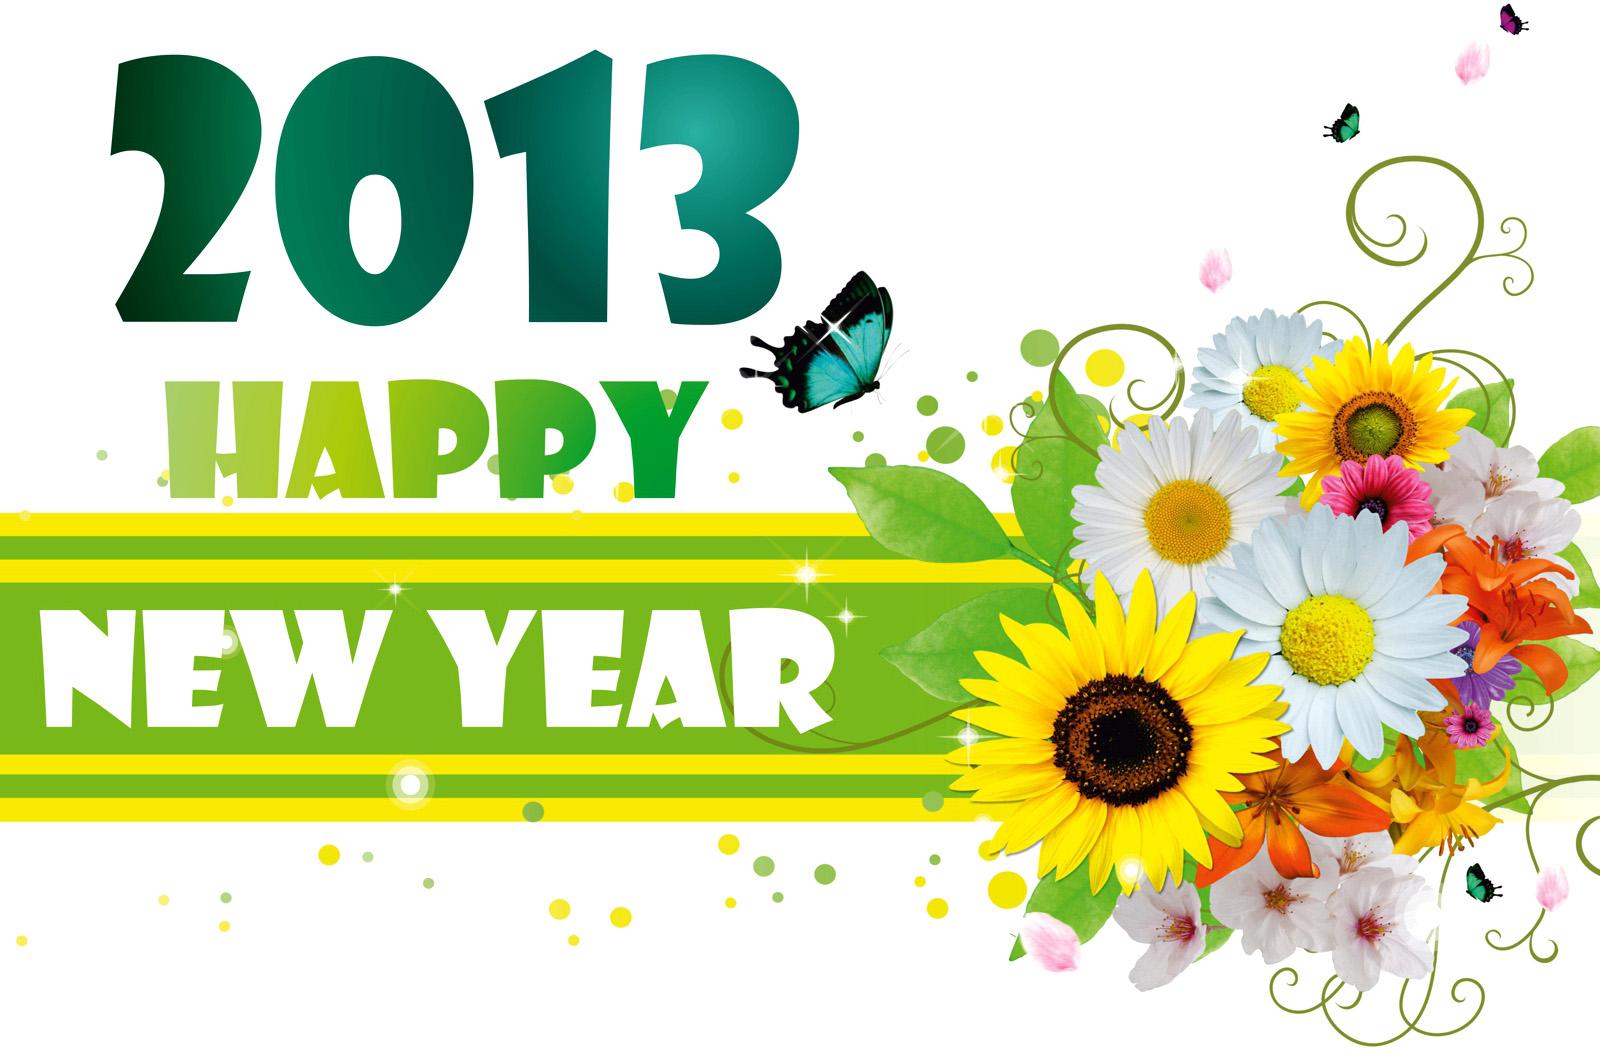 https://2.bp.blogspot.com/-_74PXVUy_-s/UMYqie7YuyI/AAAAAAAAAh8/CLqFWu-eRM8/s1600/Happy+New+Year+2013+Full+HD+Wallpaper+%25284%2529.jpg